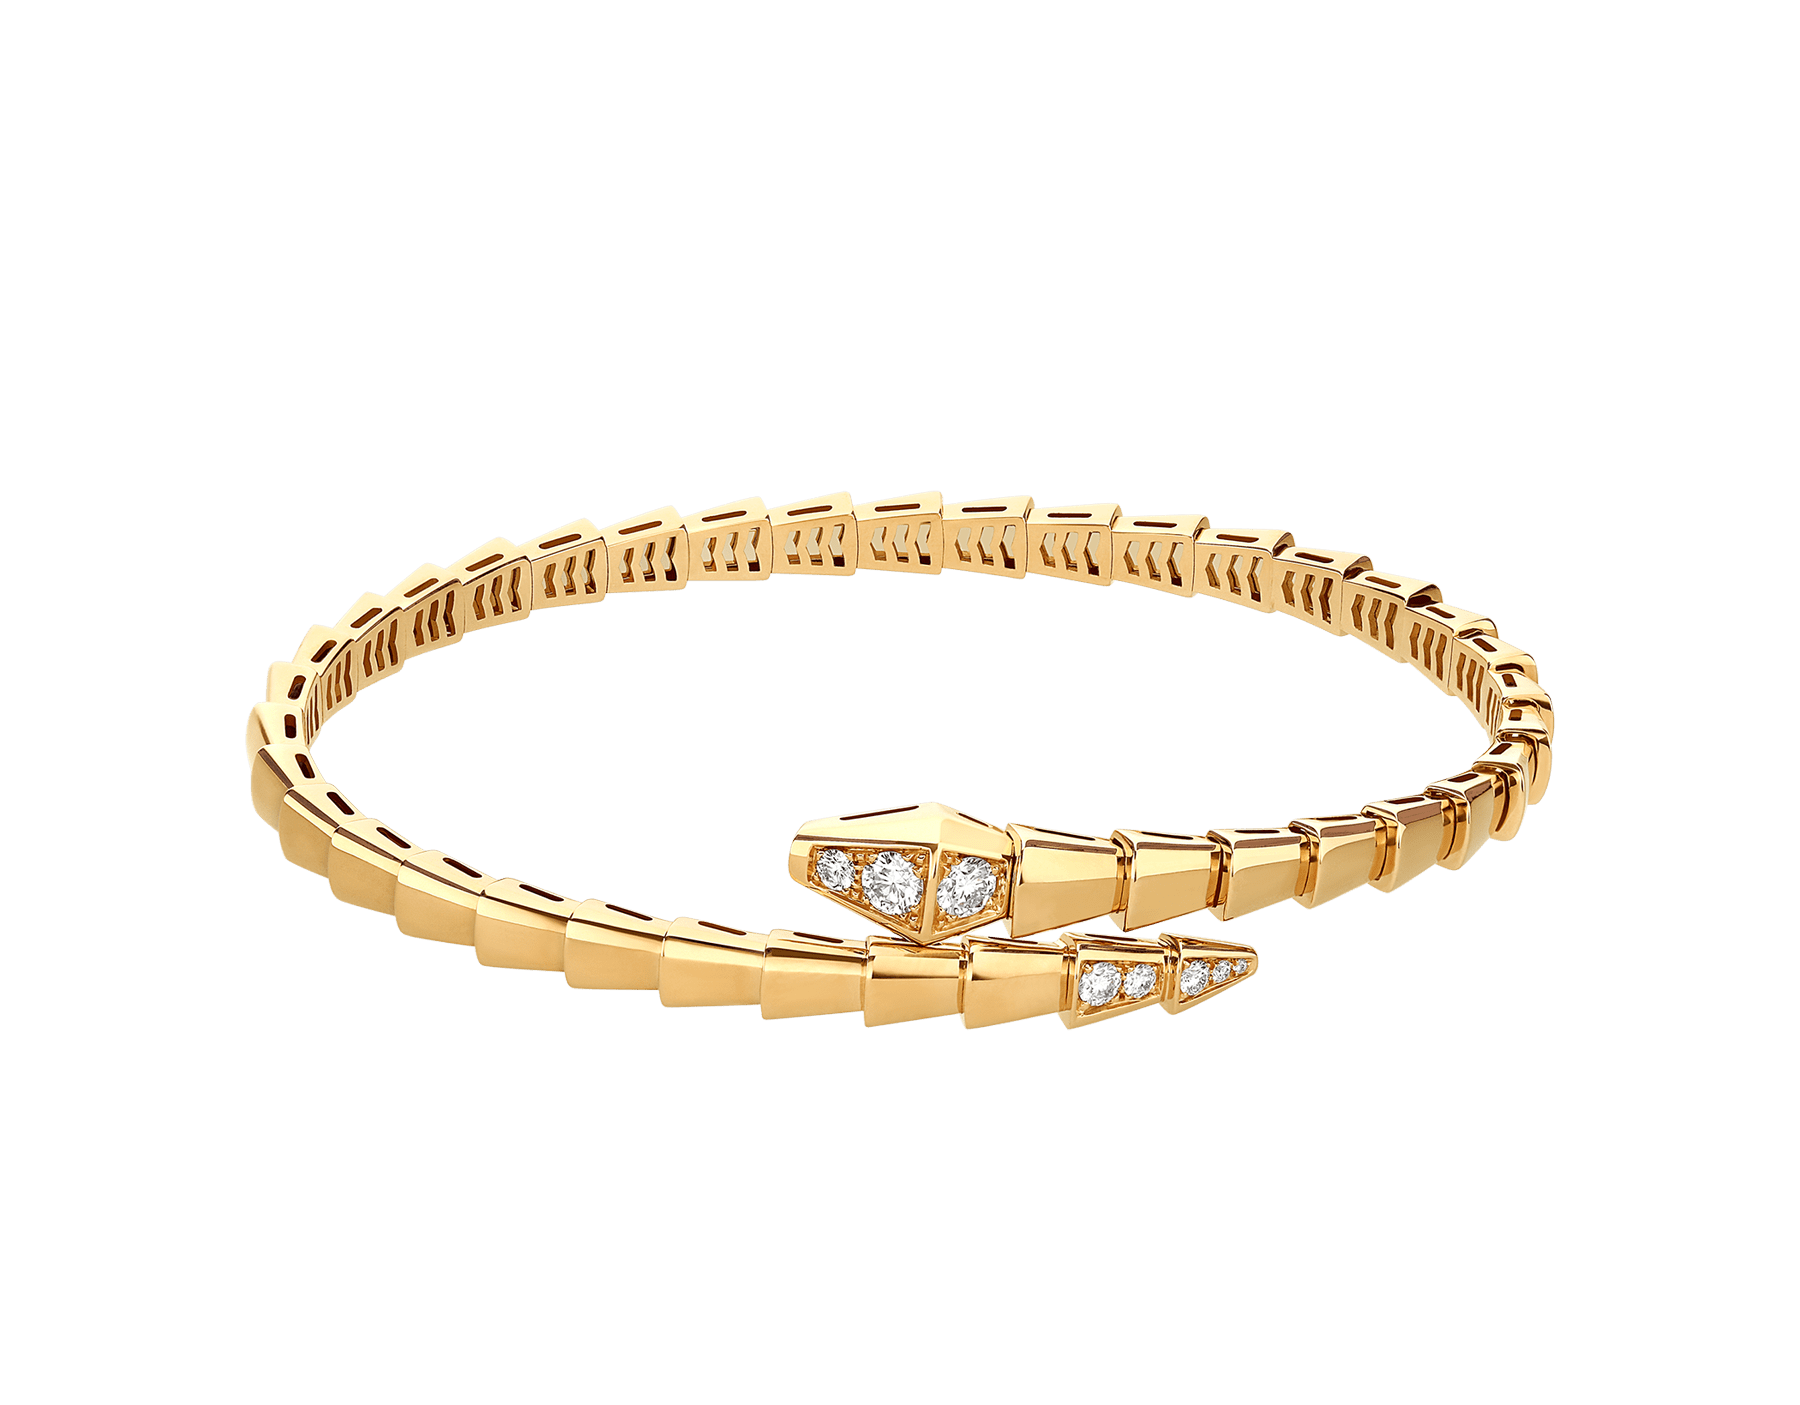 Serpenti Viper 18 kt yellow gold bracelet set with demi-pavé diamonds BR858972 image 2